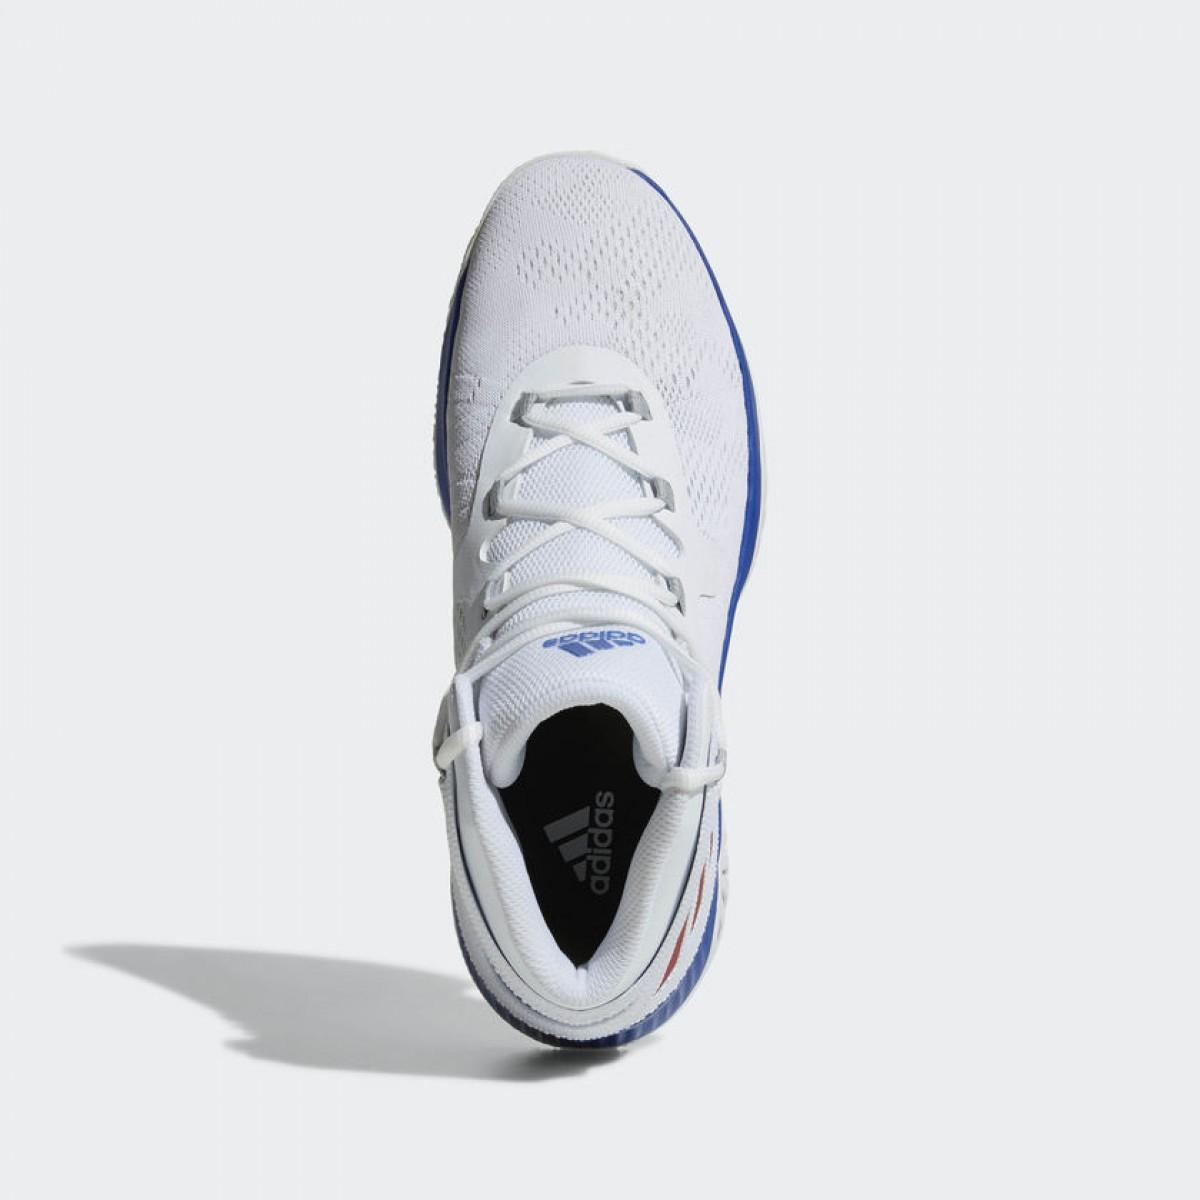 Adidas Explosive Bounce 'White' CQ0214